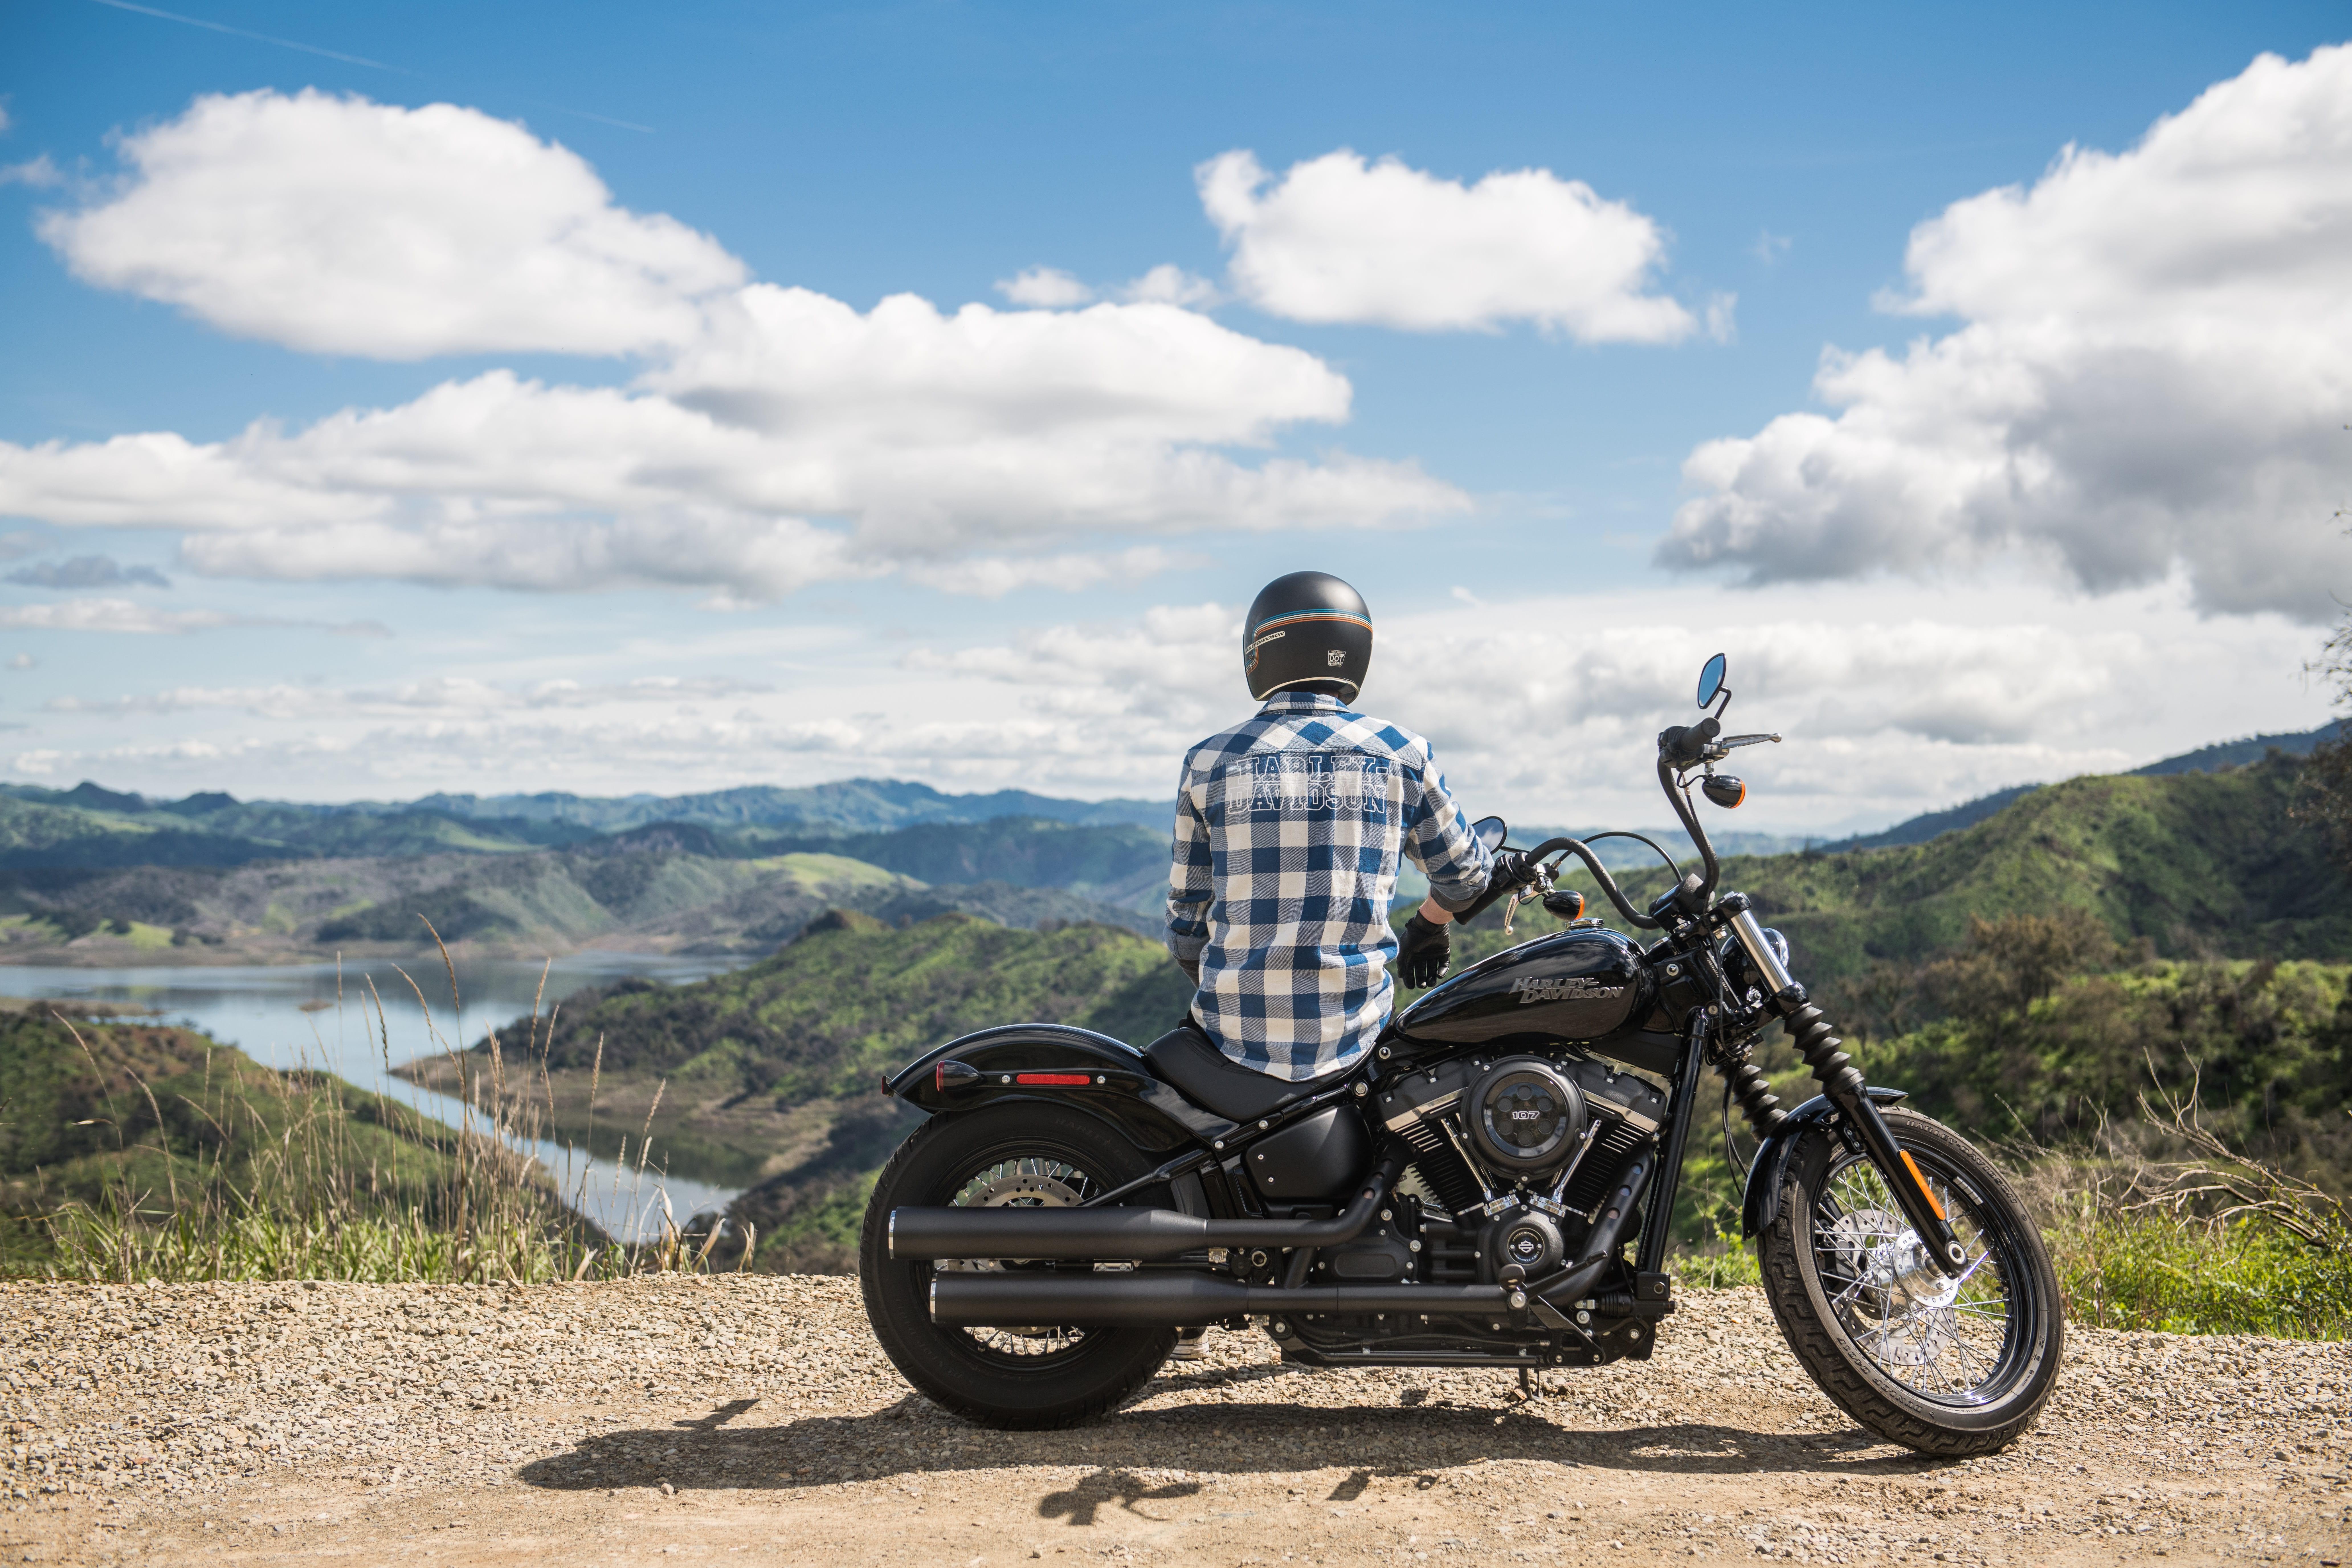 Man sitting on motorcycle, back to camera, looking at lake and mountains; image by Harley-Davidson via Unsplash.com.